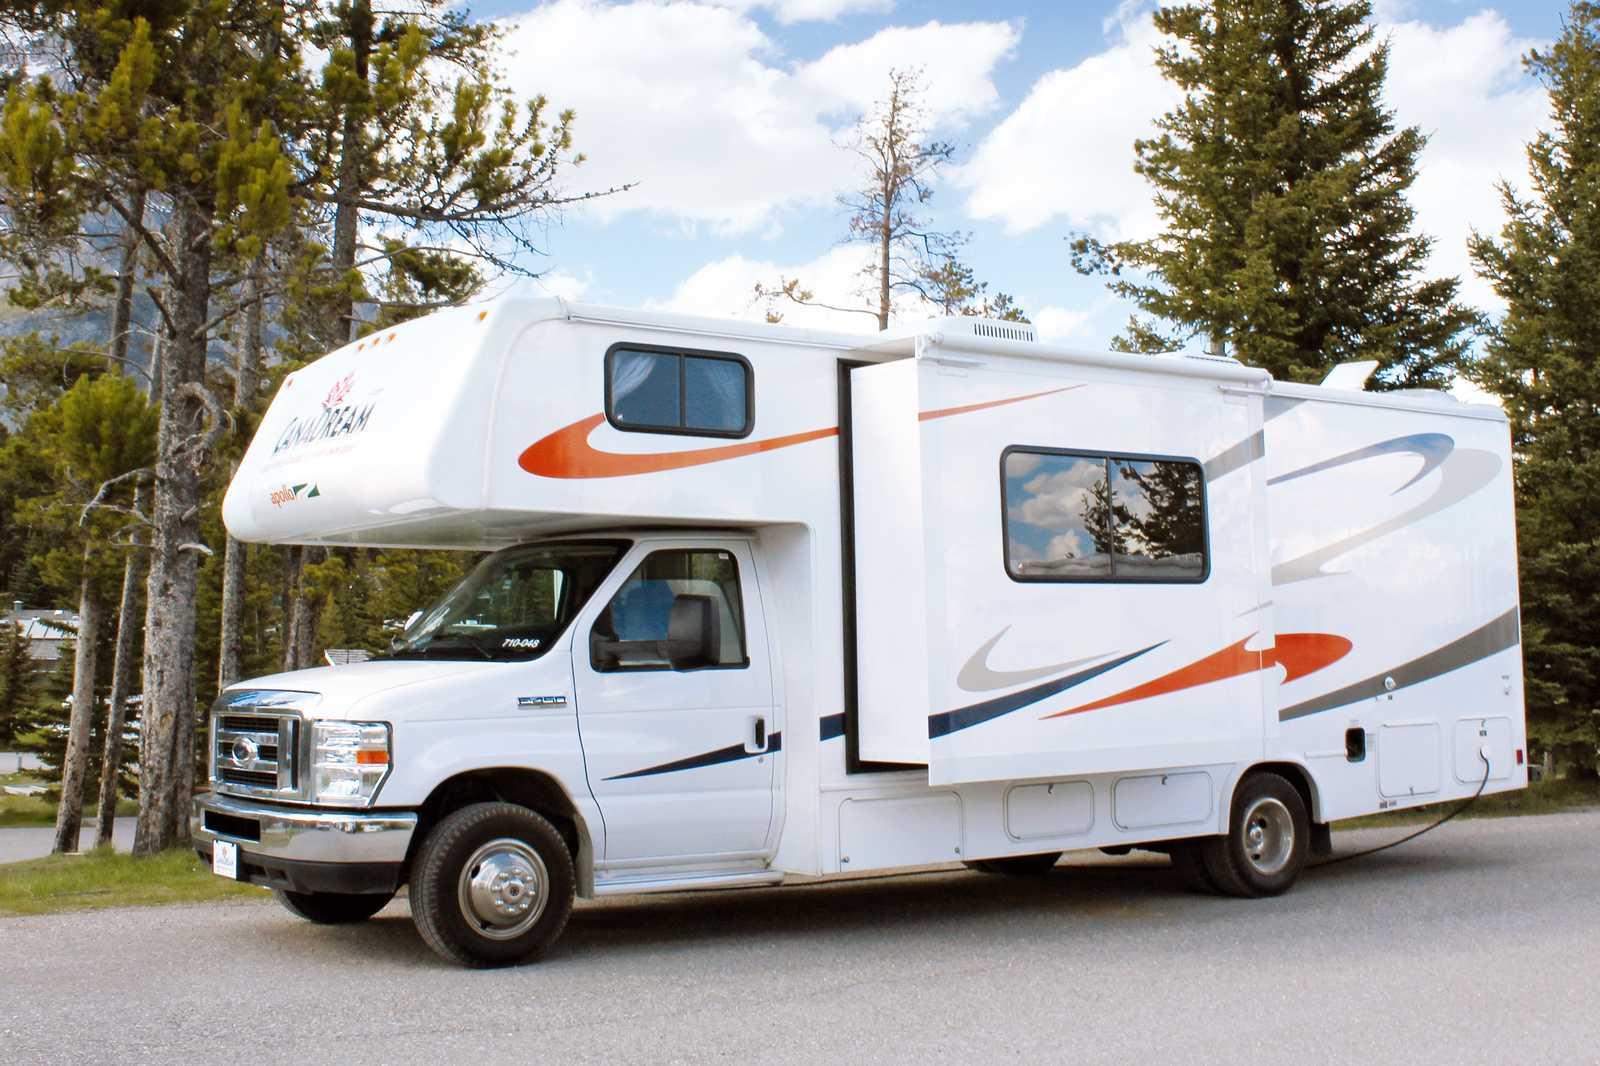 wohnmobile kanada westcoast by canadream midi motorhome. Black Bedroom Furniture Sets. Home Design Ideas